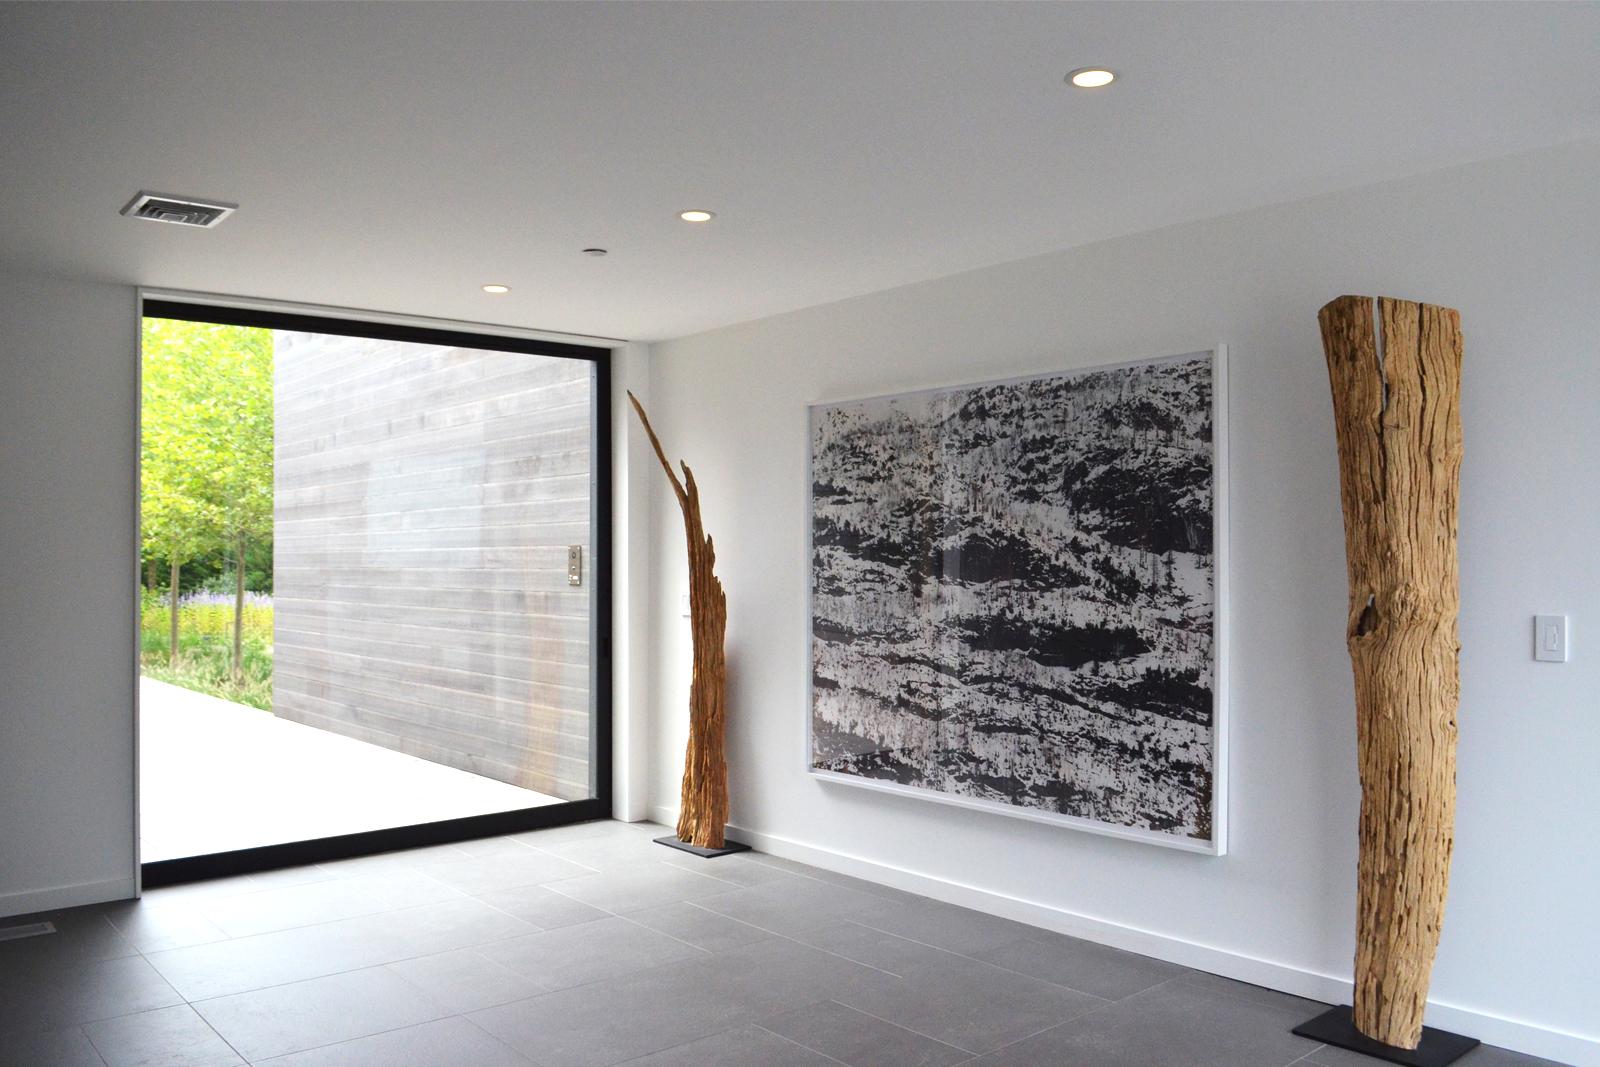 res4-resolution-4-architecture-modern-modular-house-prefab-amagansett-addition-interior.jpg